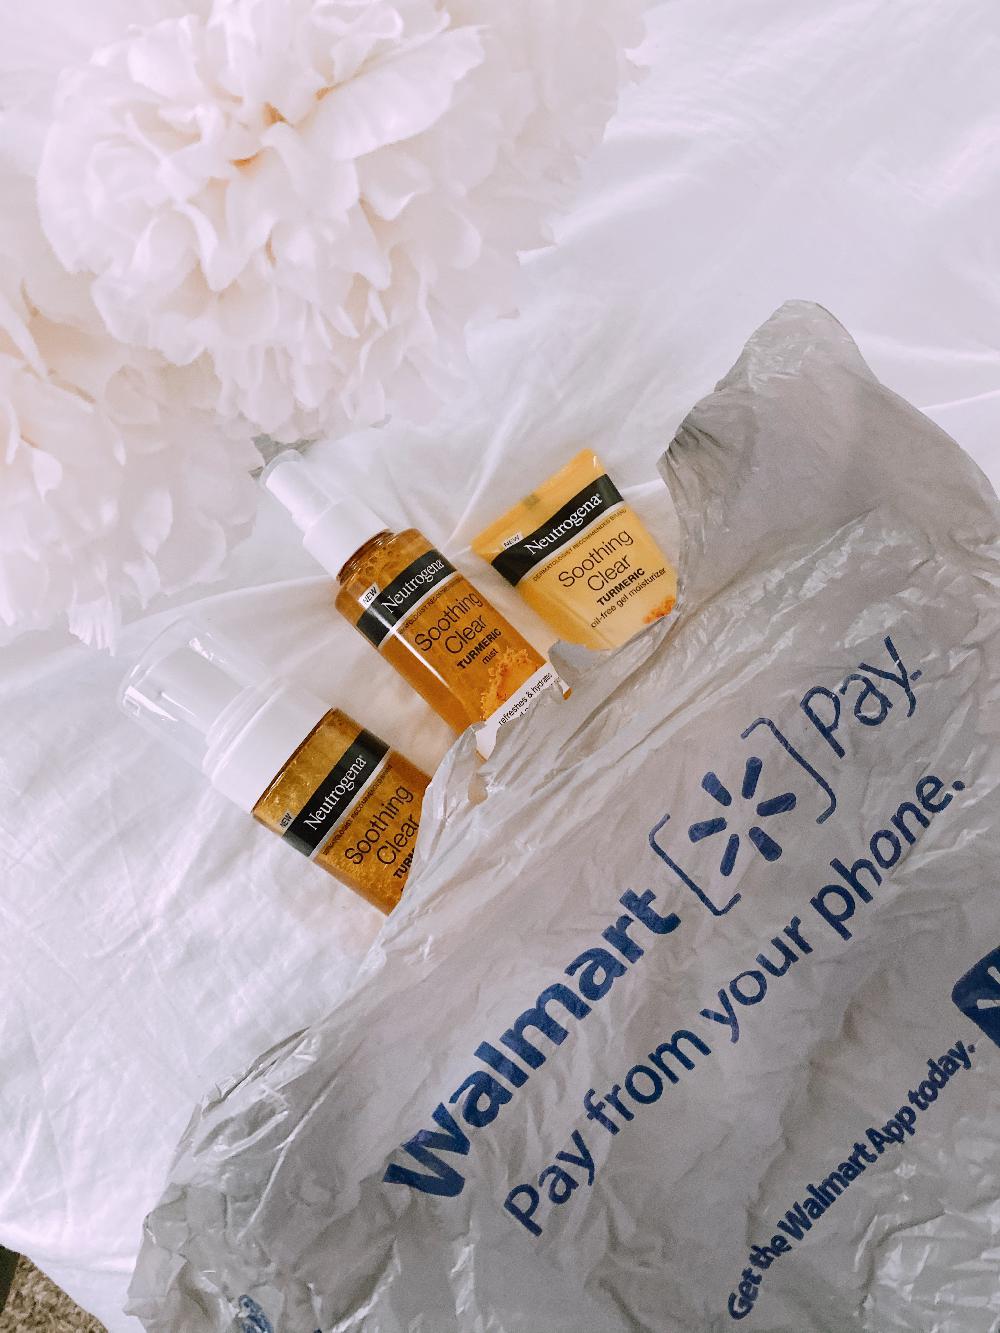 New Neutrogena® products from Walmart